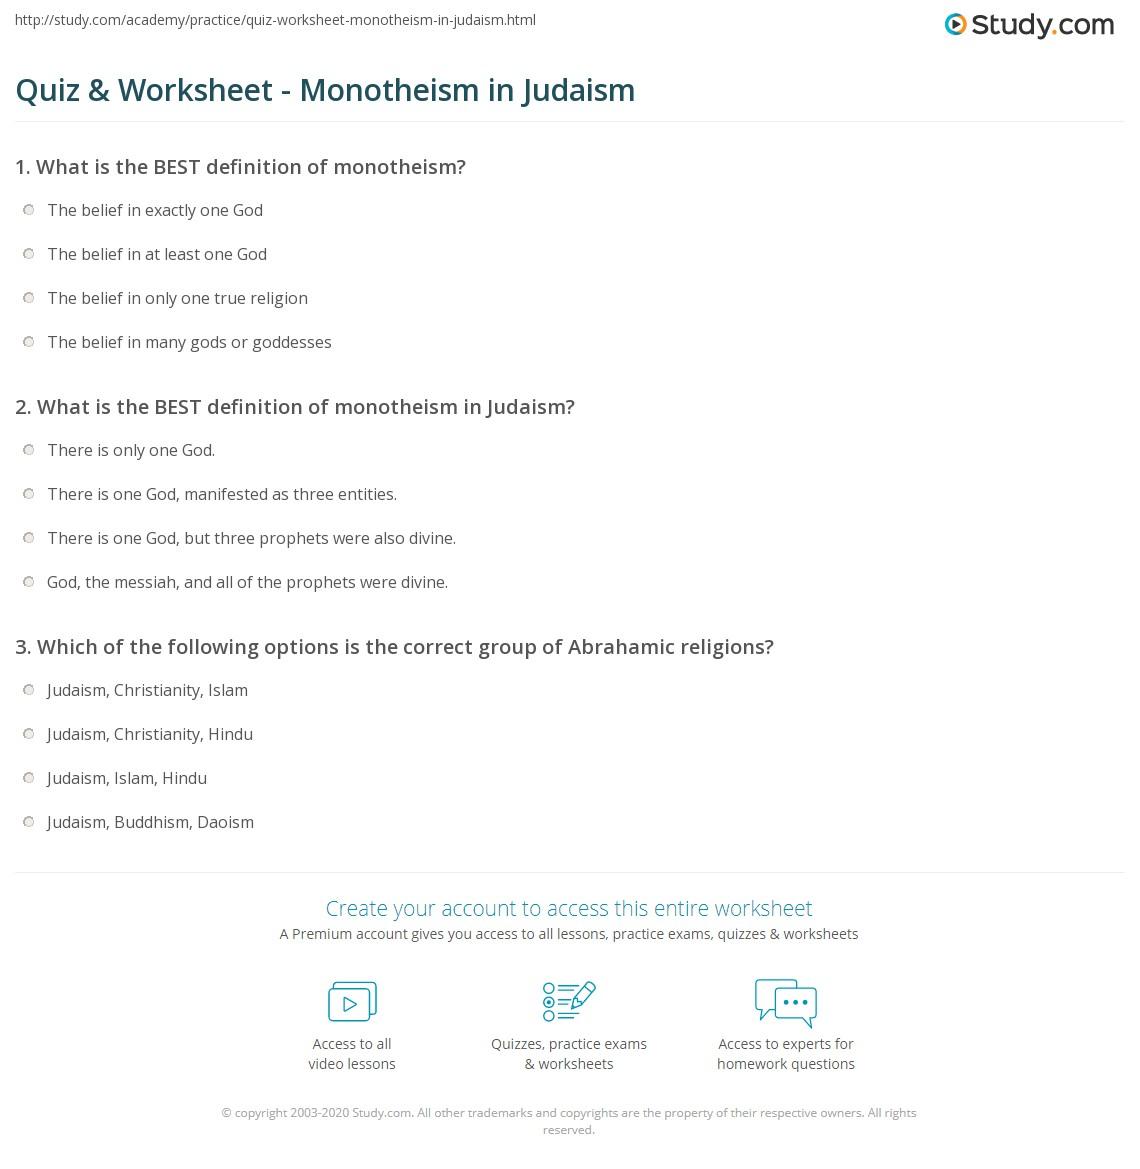 quiz & worksheet - monotheism in judaism | study